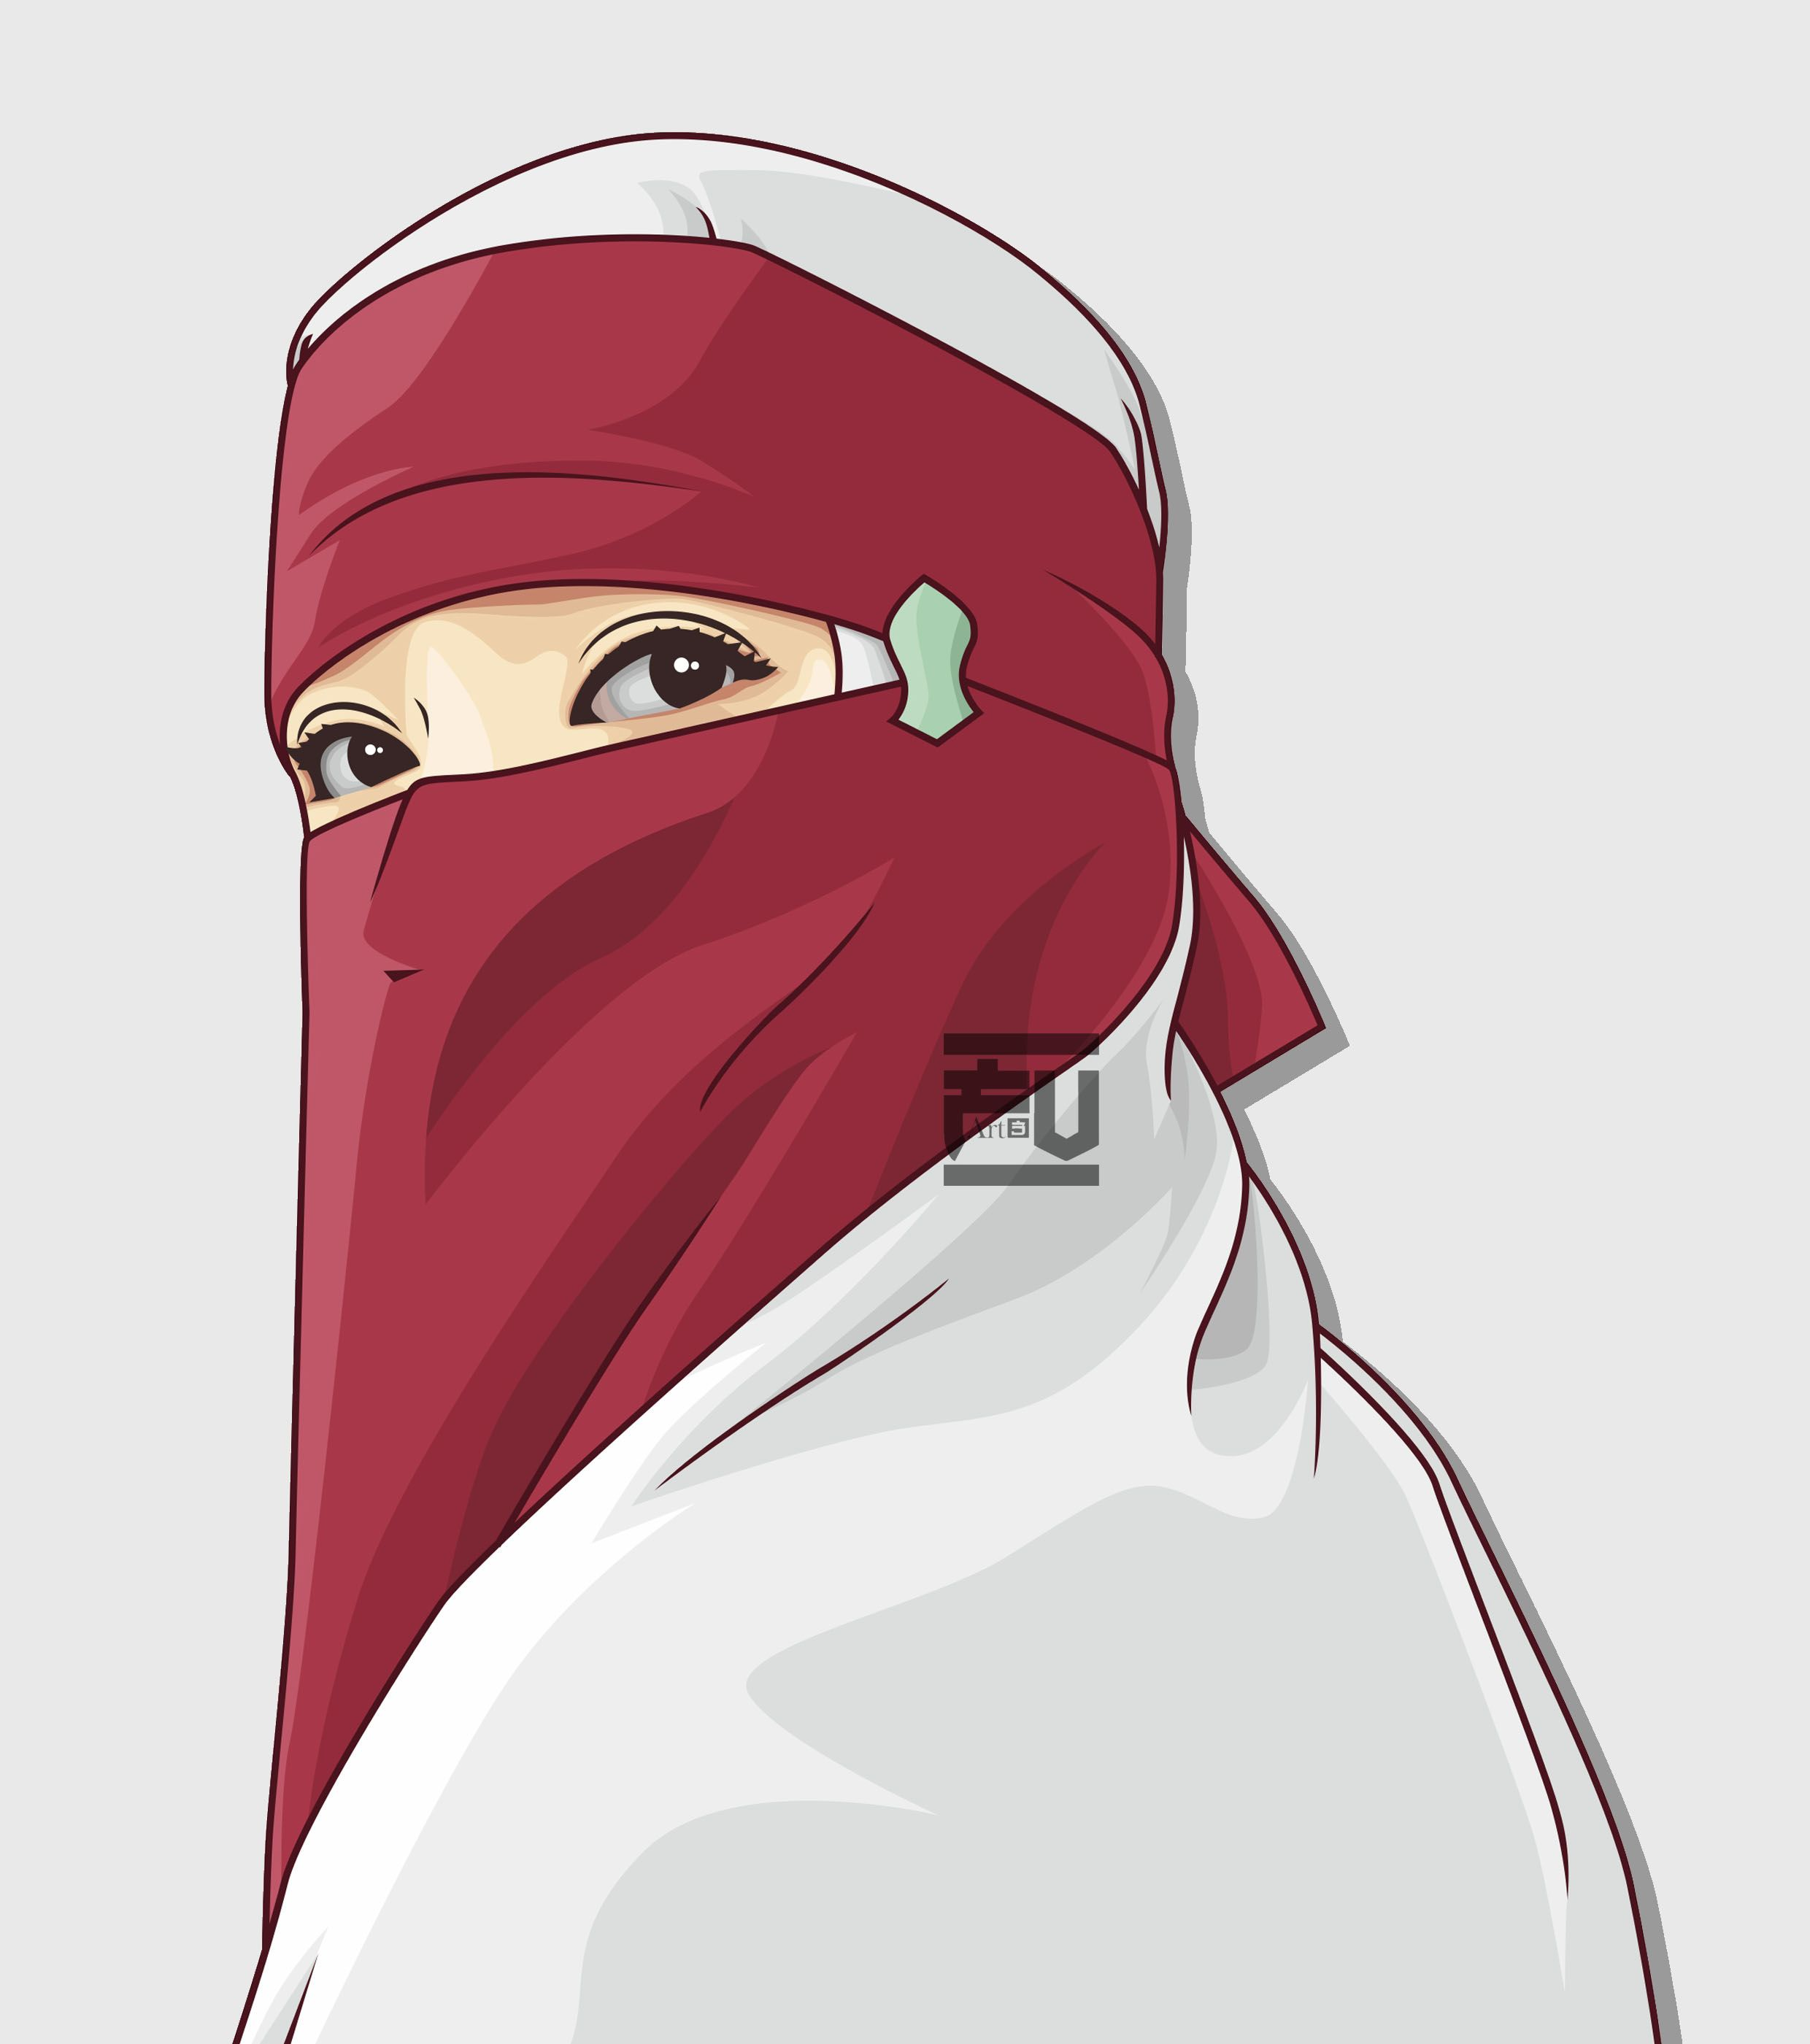 Vector Hijab Niqab Ahmadfu22 Kartun Ilustrasi Karakter Gambar